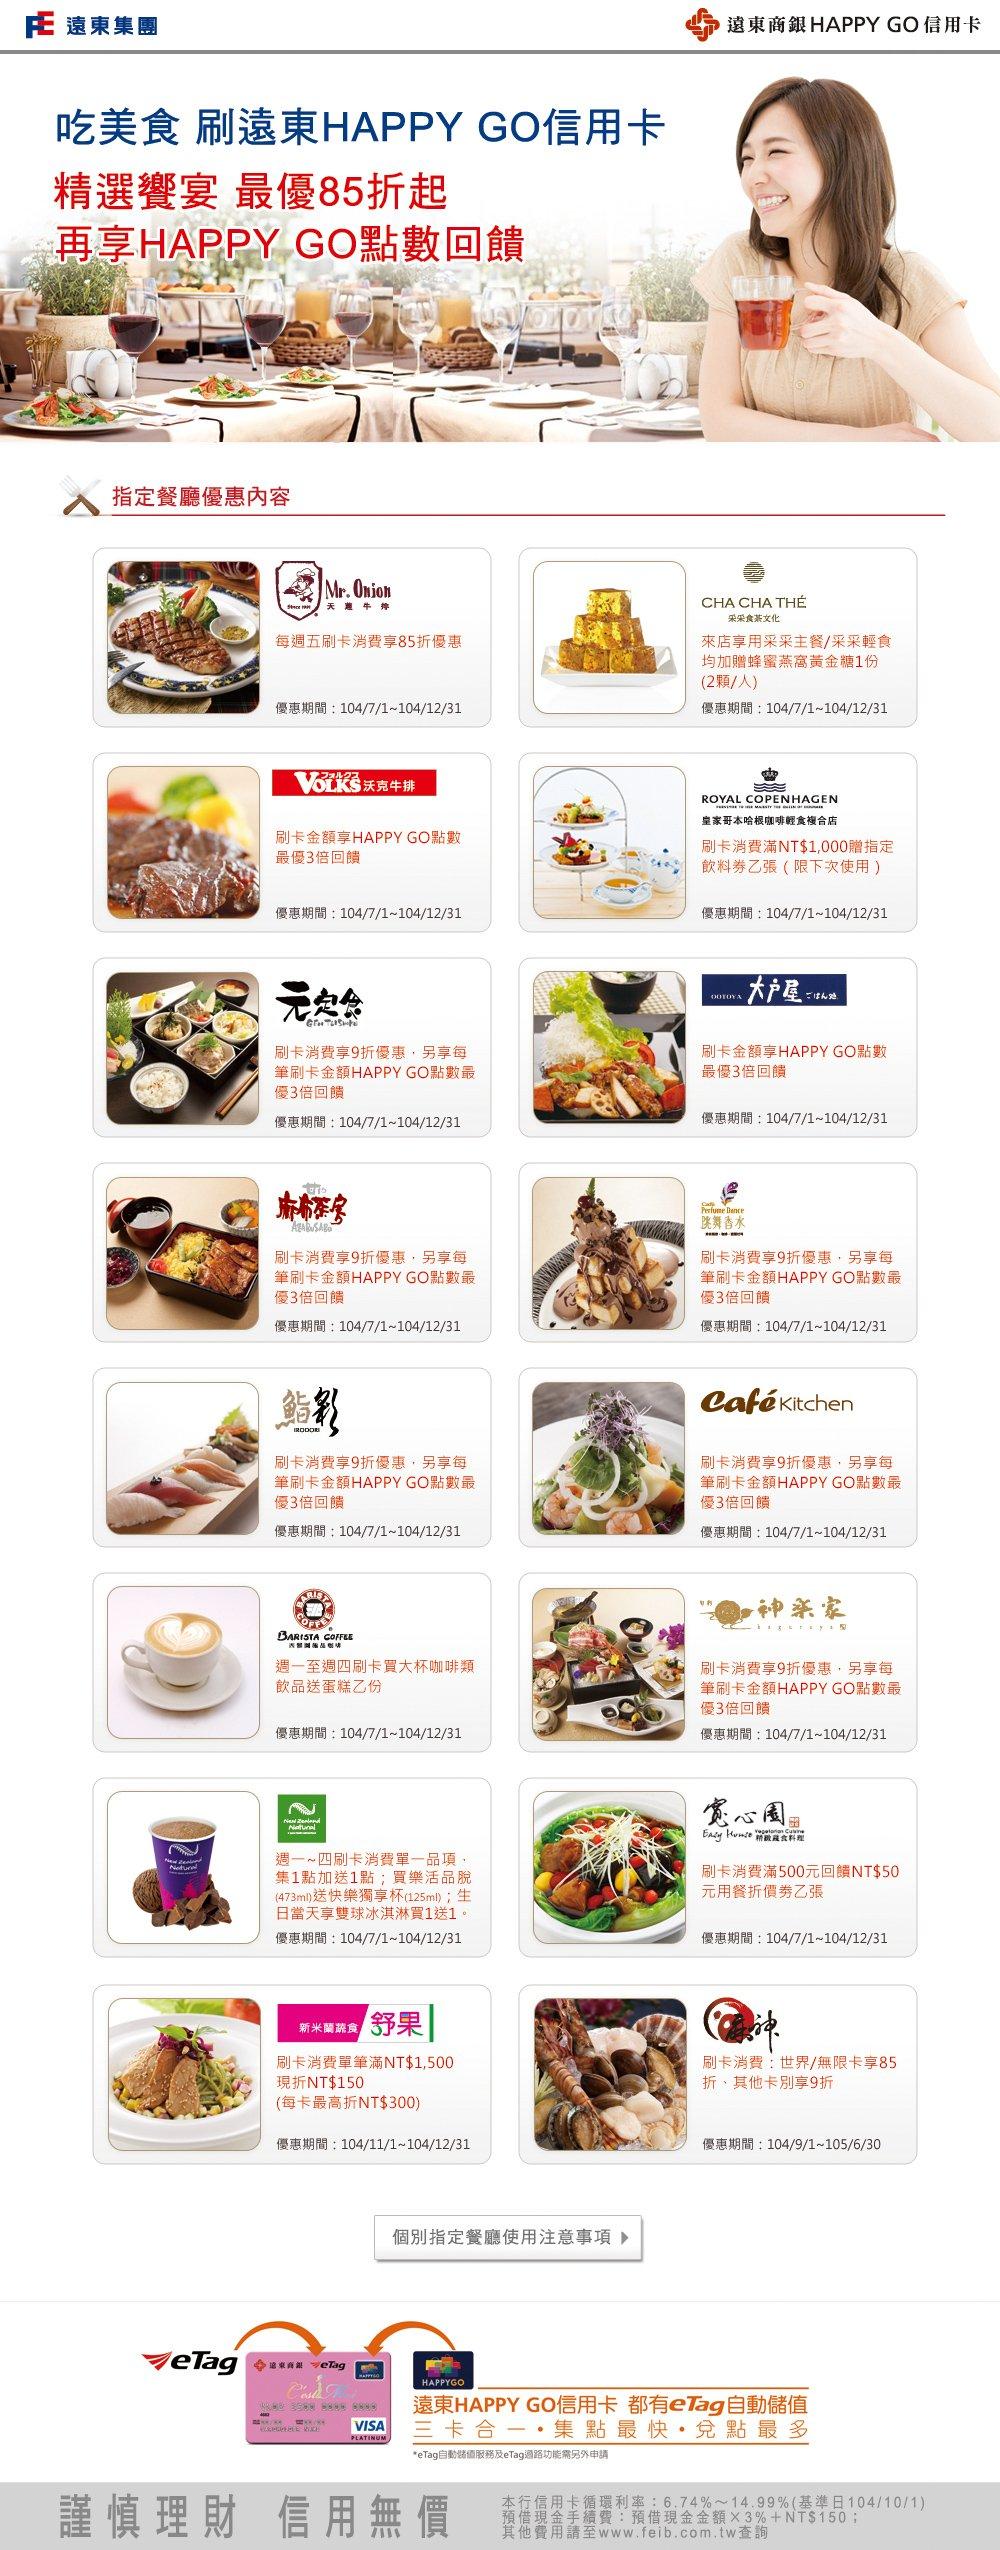 遠東商銀-精選饗宴HAPPY GO回饋金點數